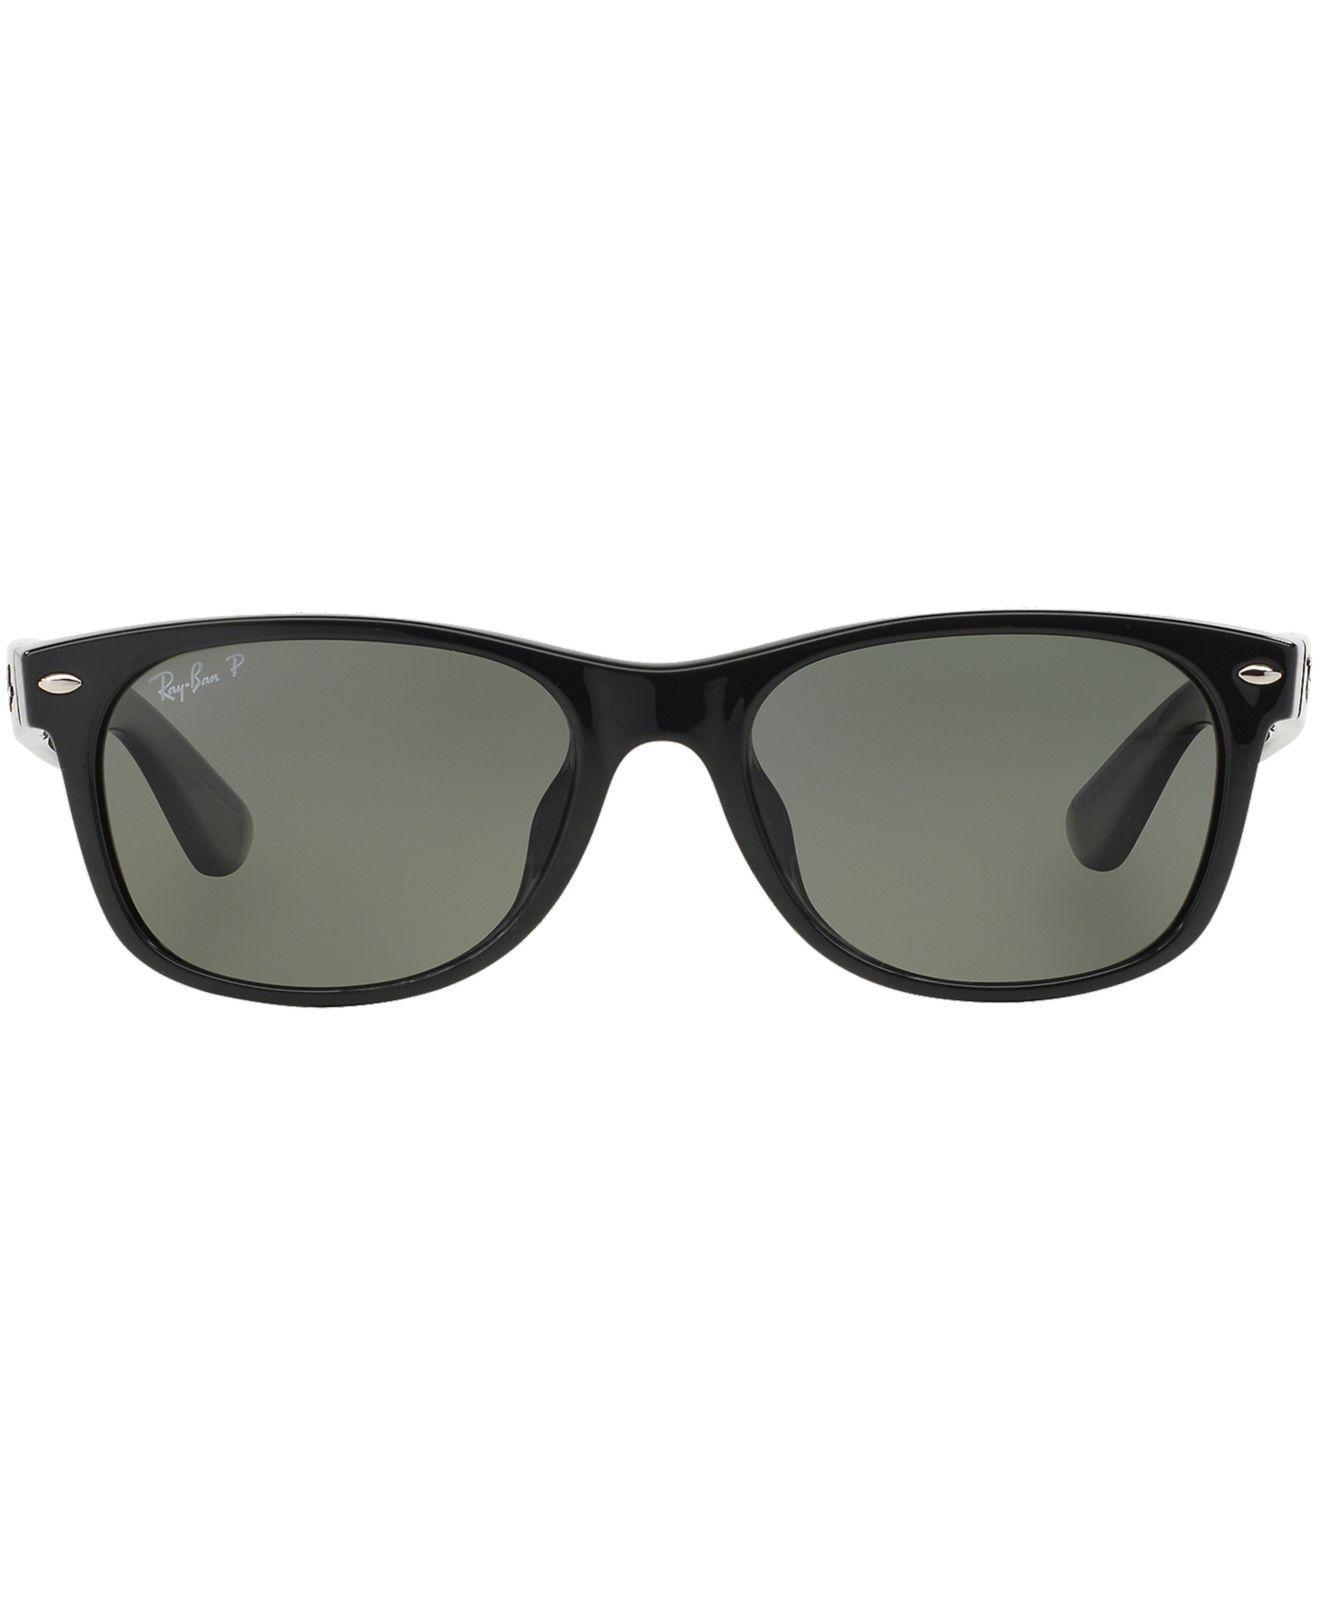 8f953fdbb7a9f Lyst - Ray-Ban Polarized Sunglasses